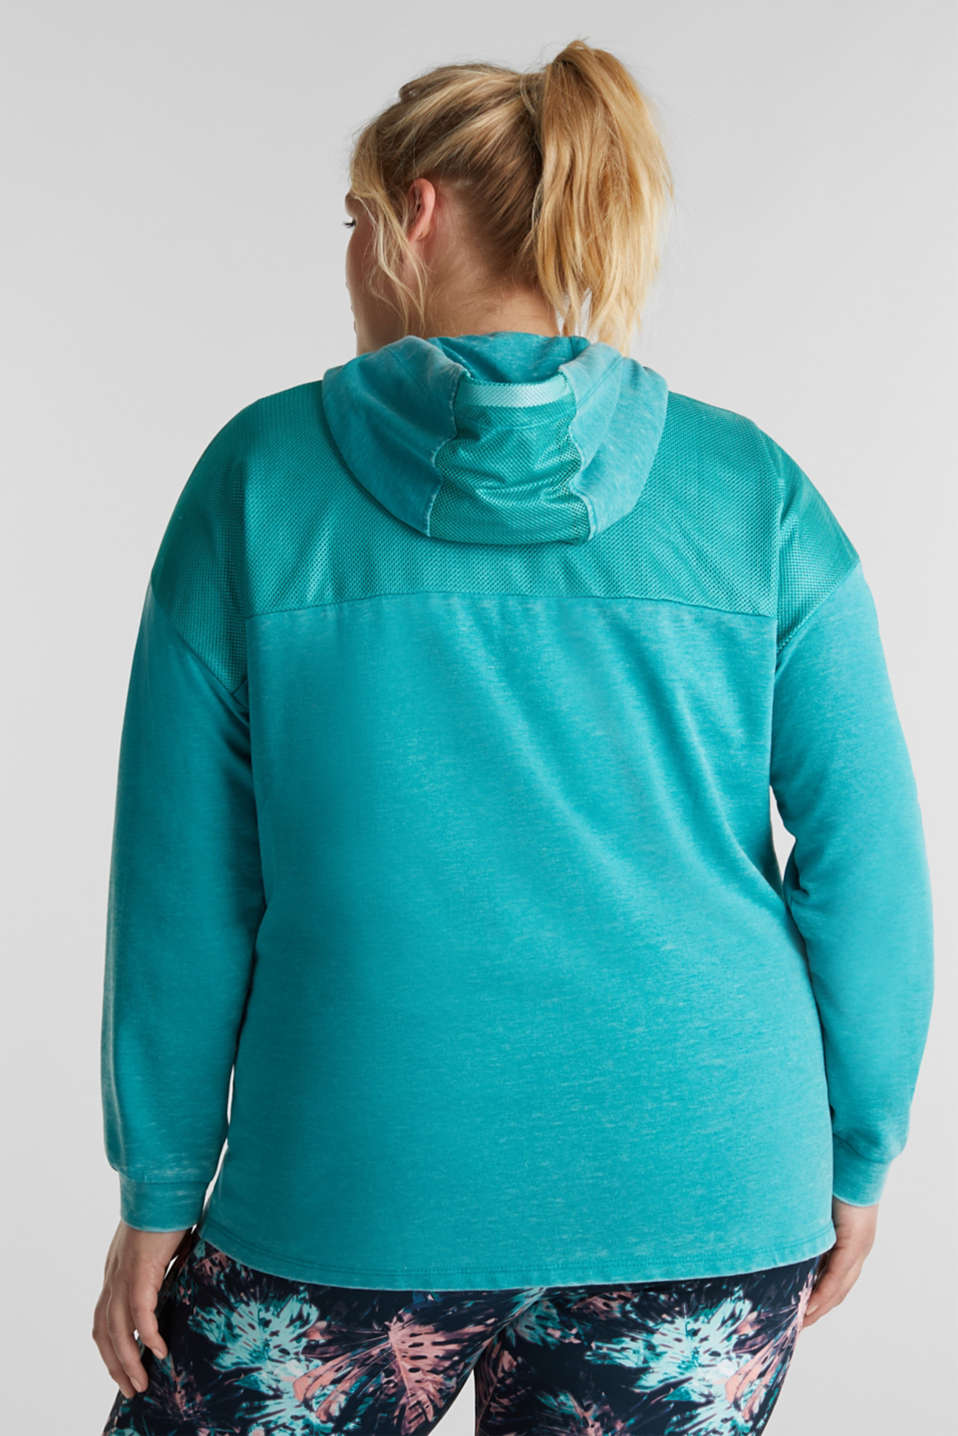 Curvy sweatshirt cardigan with a hood, TEAL GREEN, detail image number 3